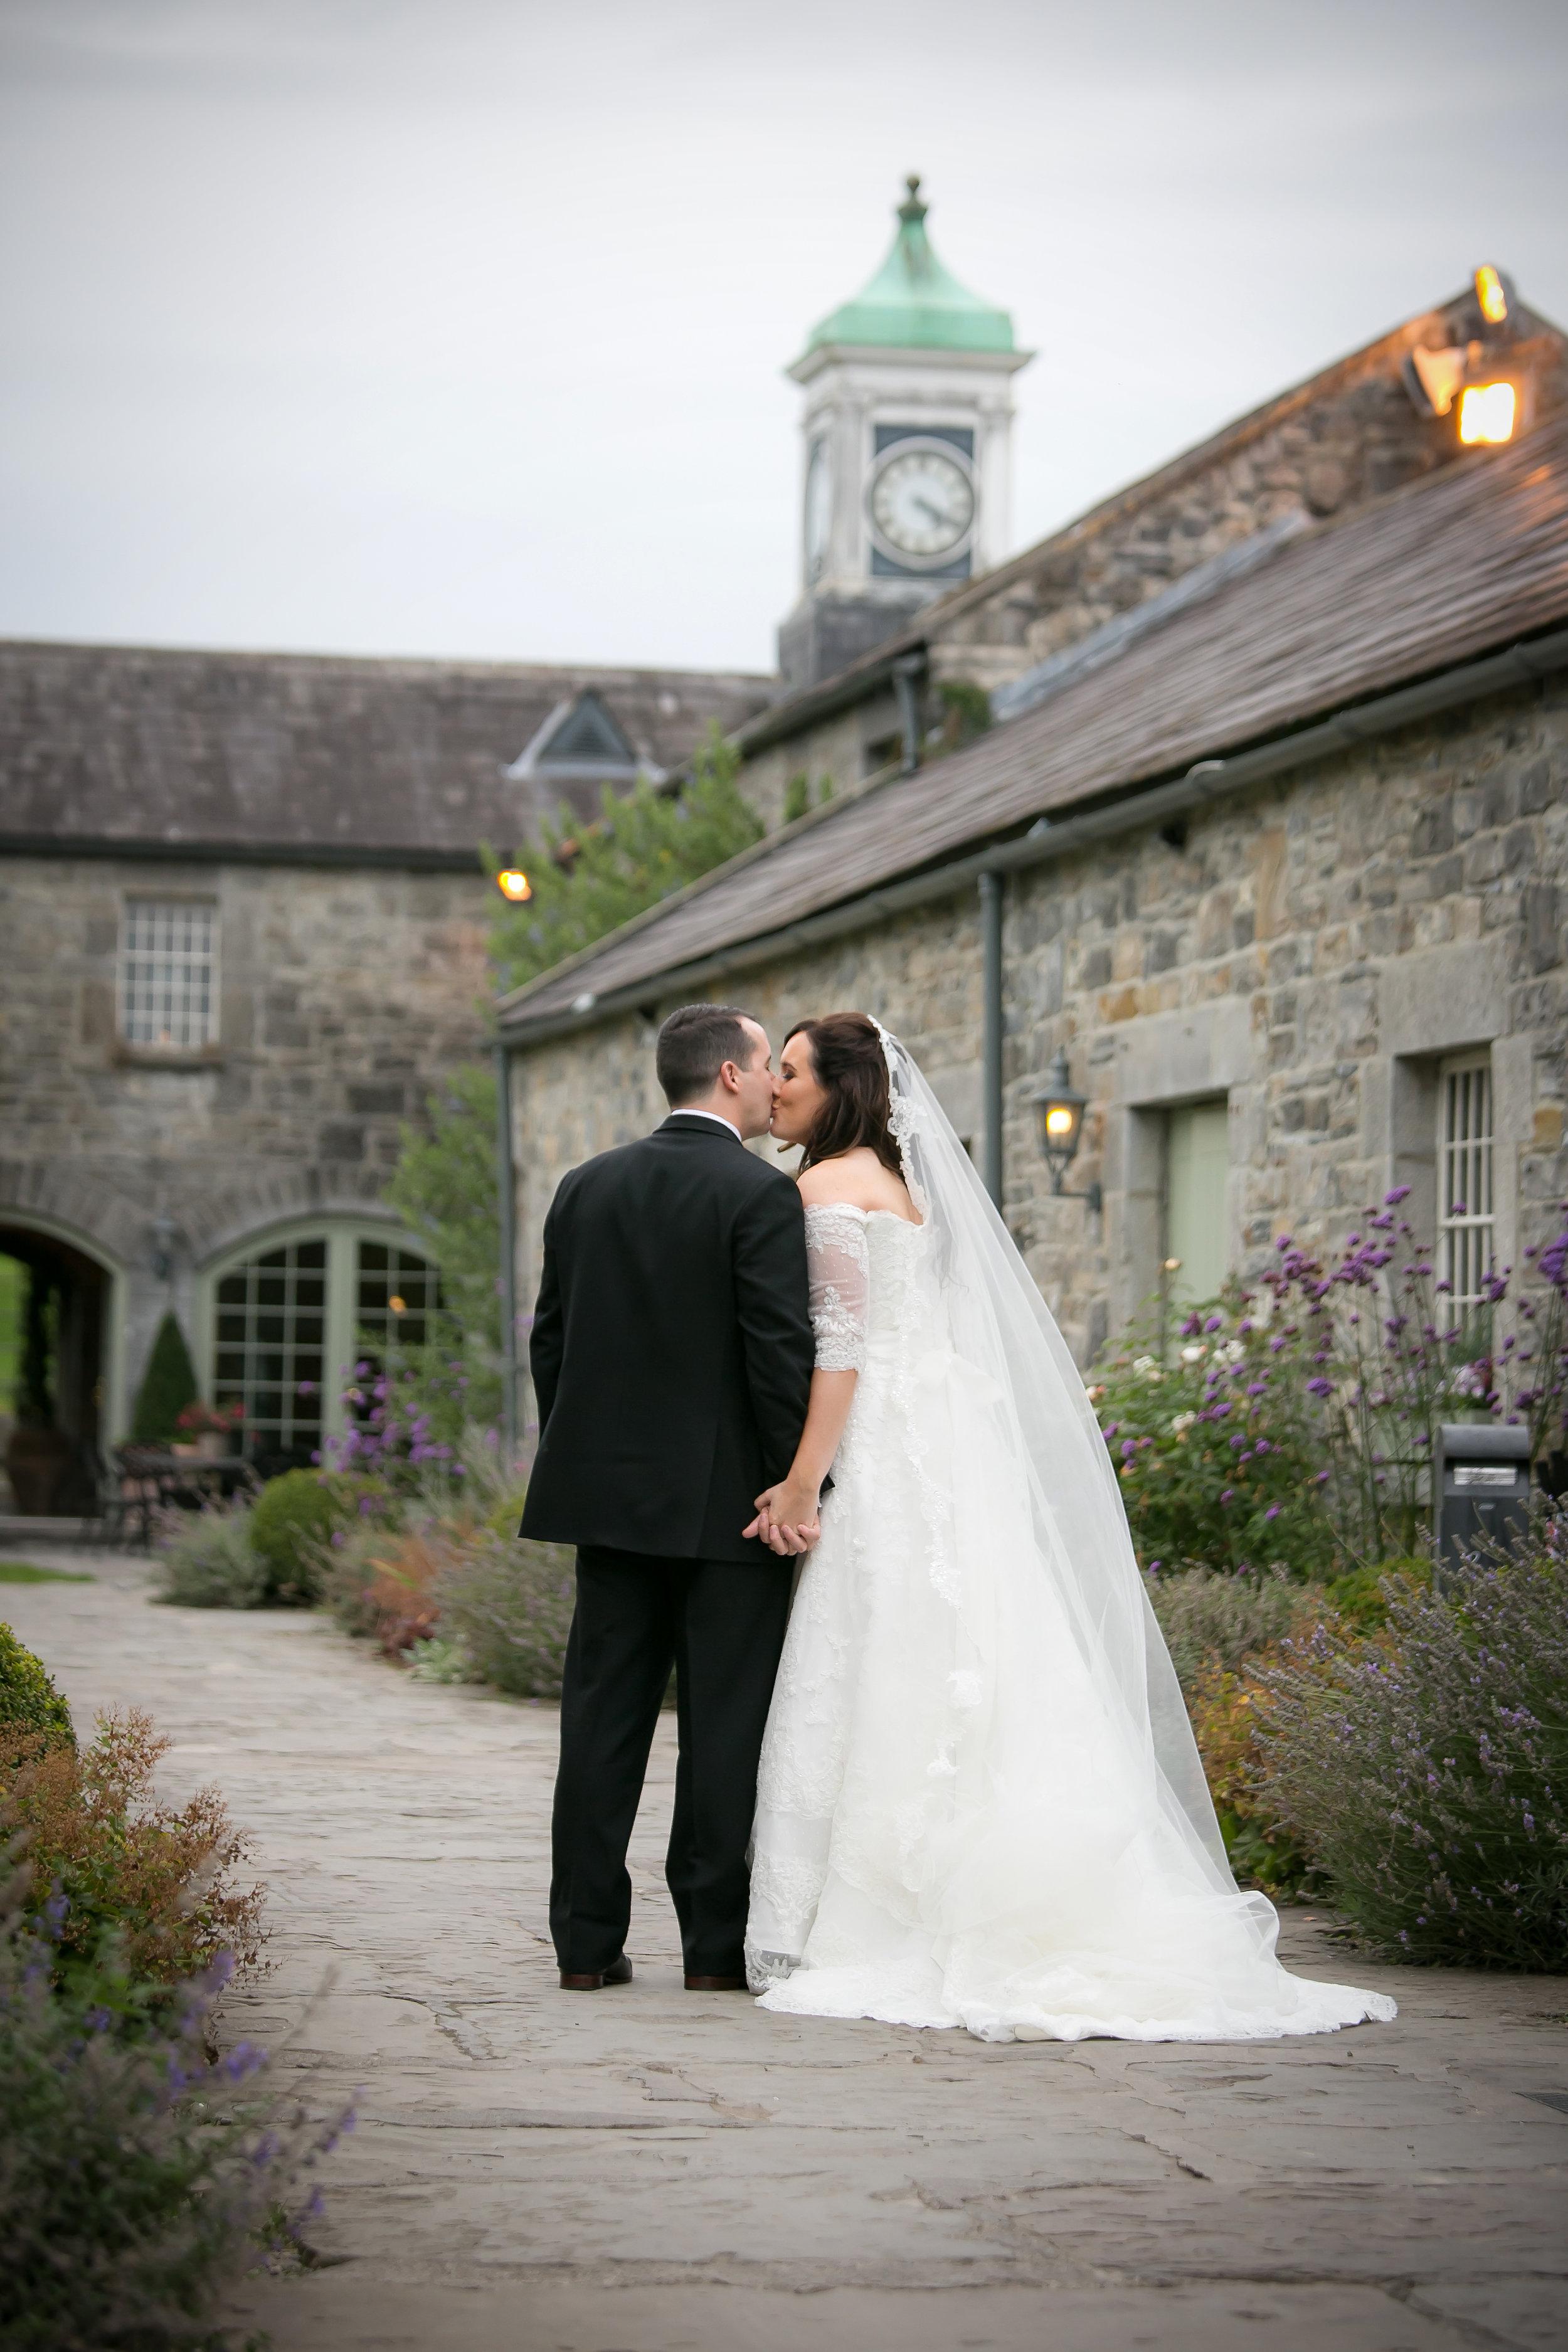 Laura & Craig @ Ballymagarvey Village - WeddingsOnline